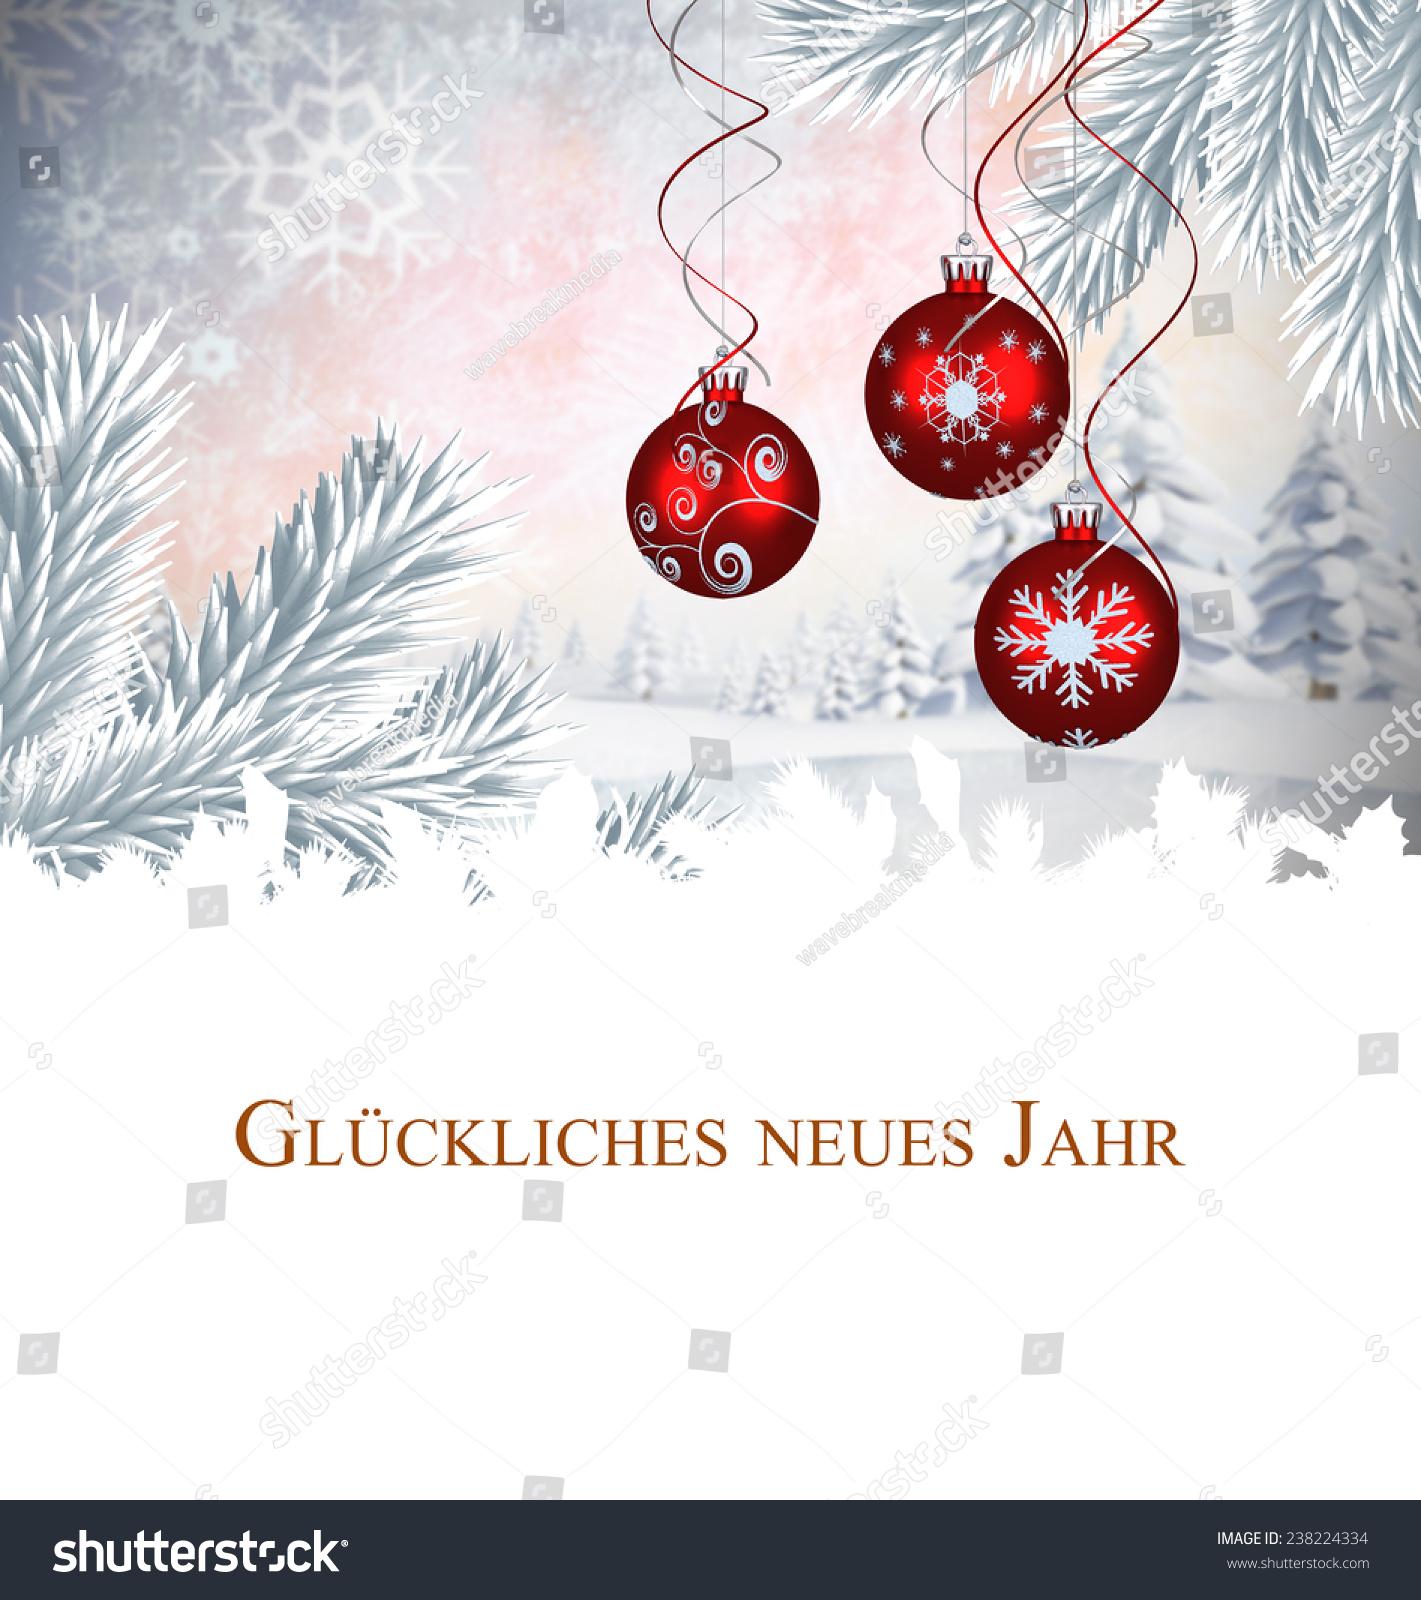 Christmas Greeting German Against Digital Hanging Stock Illustration